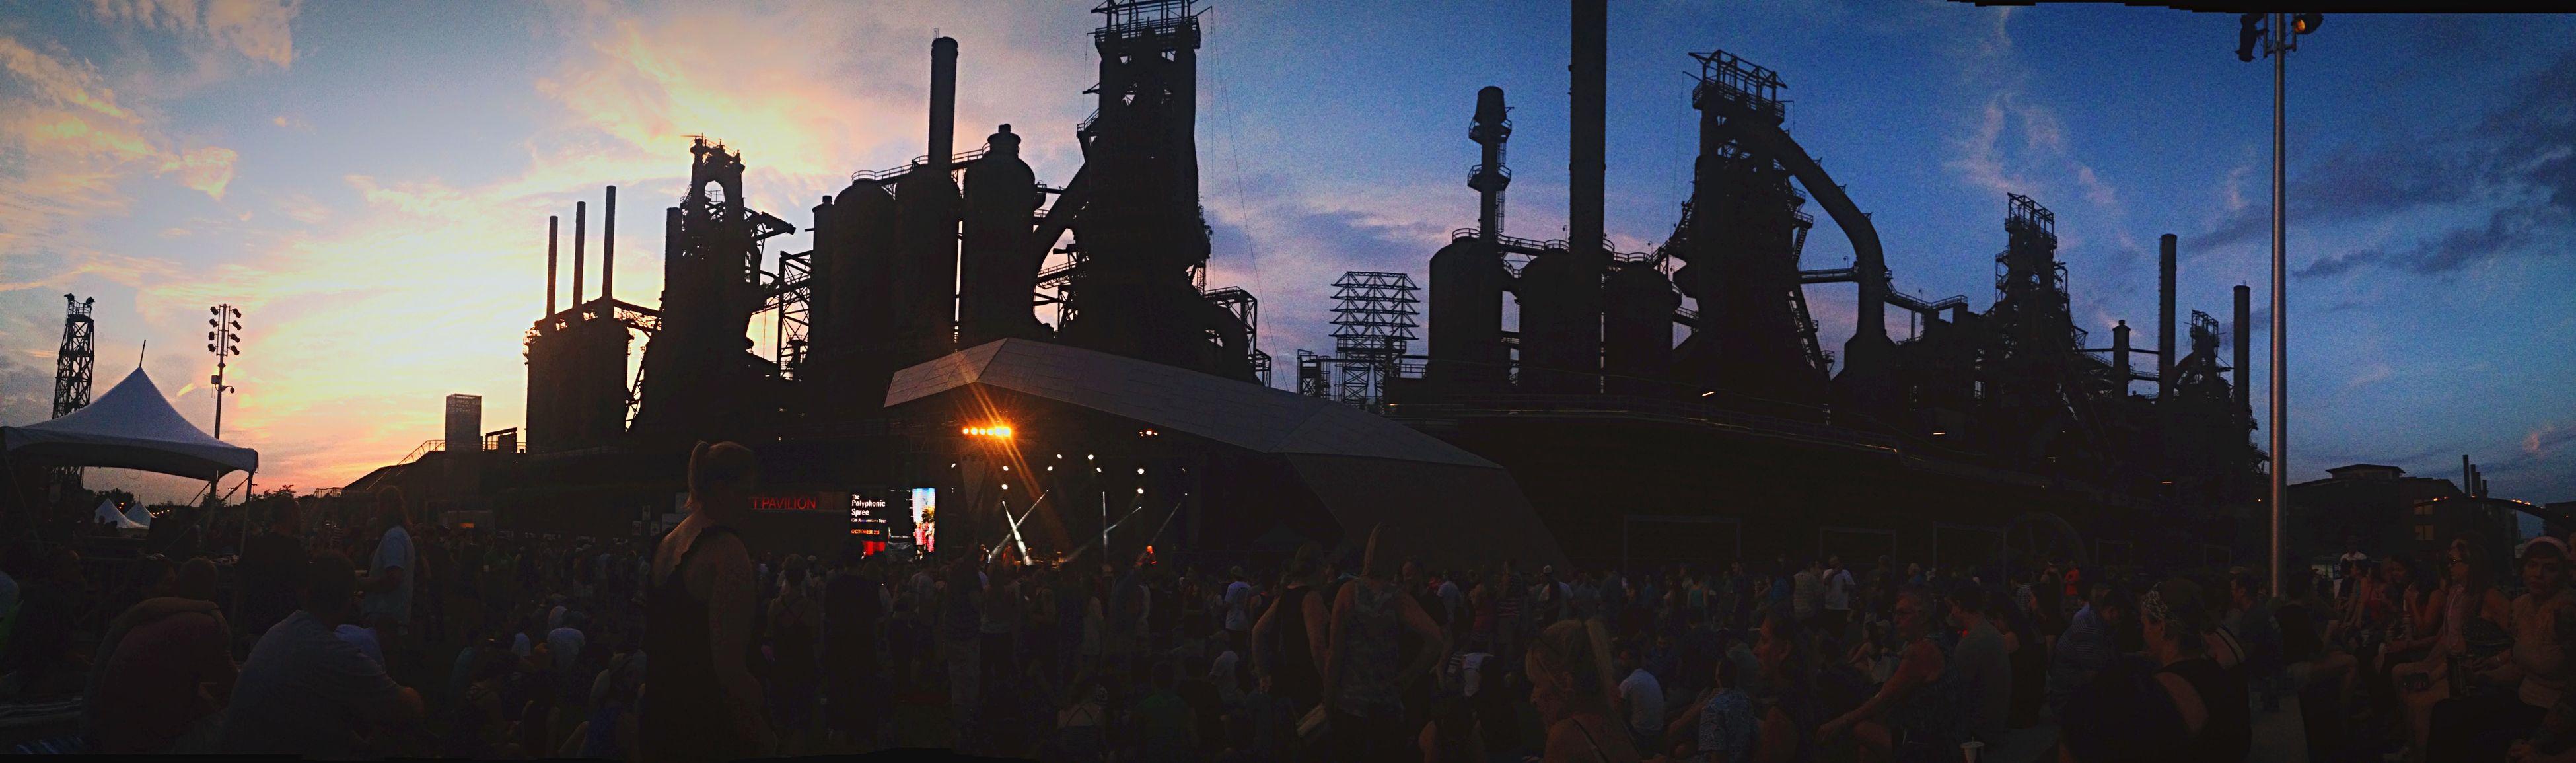 sky, built structure, building exterior, architecture, sunset, silhouette, dusk, illuminated, city, crane - construction machinery, low angle view, outdoors, cloud - sky, large group of people, development, construction site, crane, arts culture and entertainment, city life, cloud